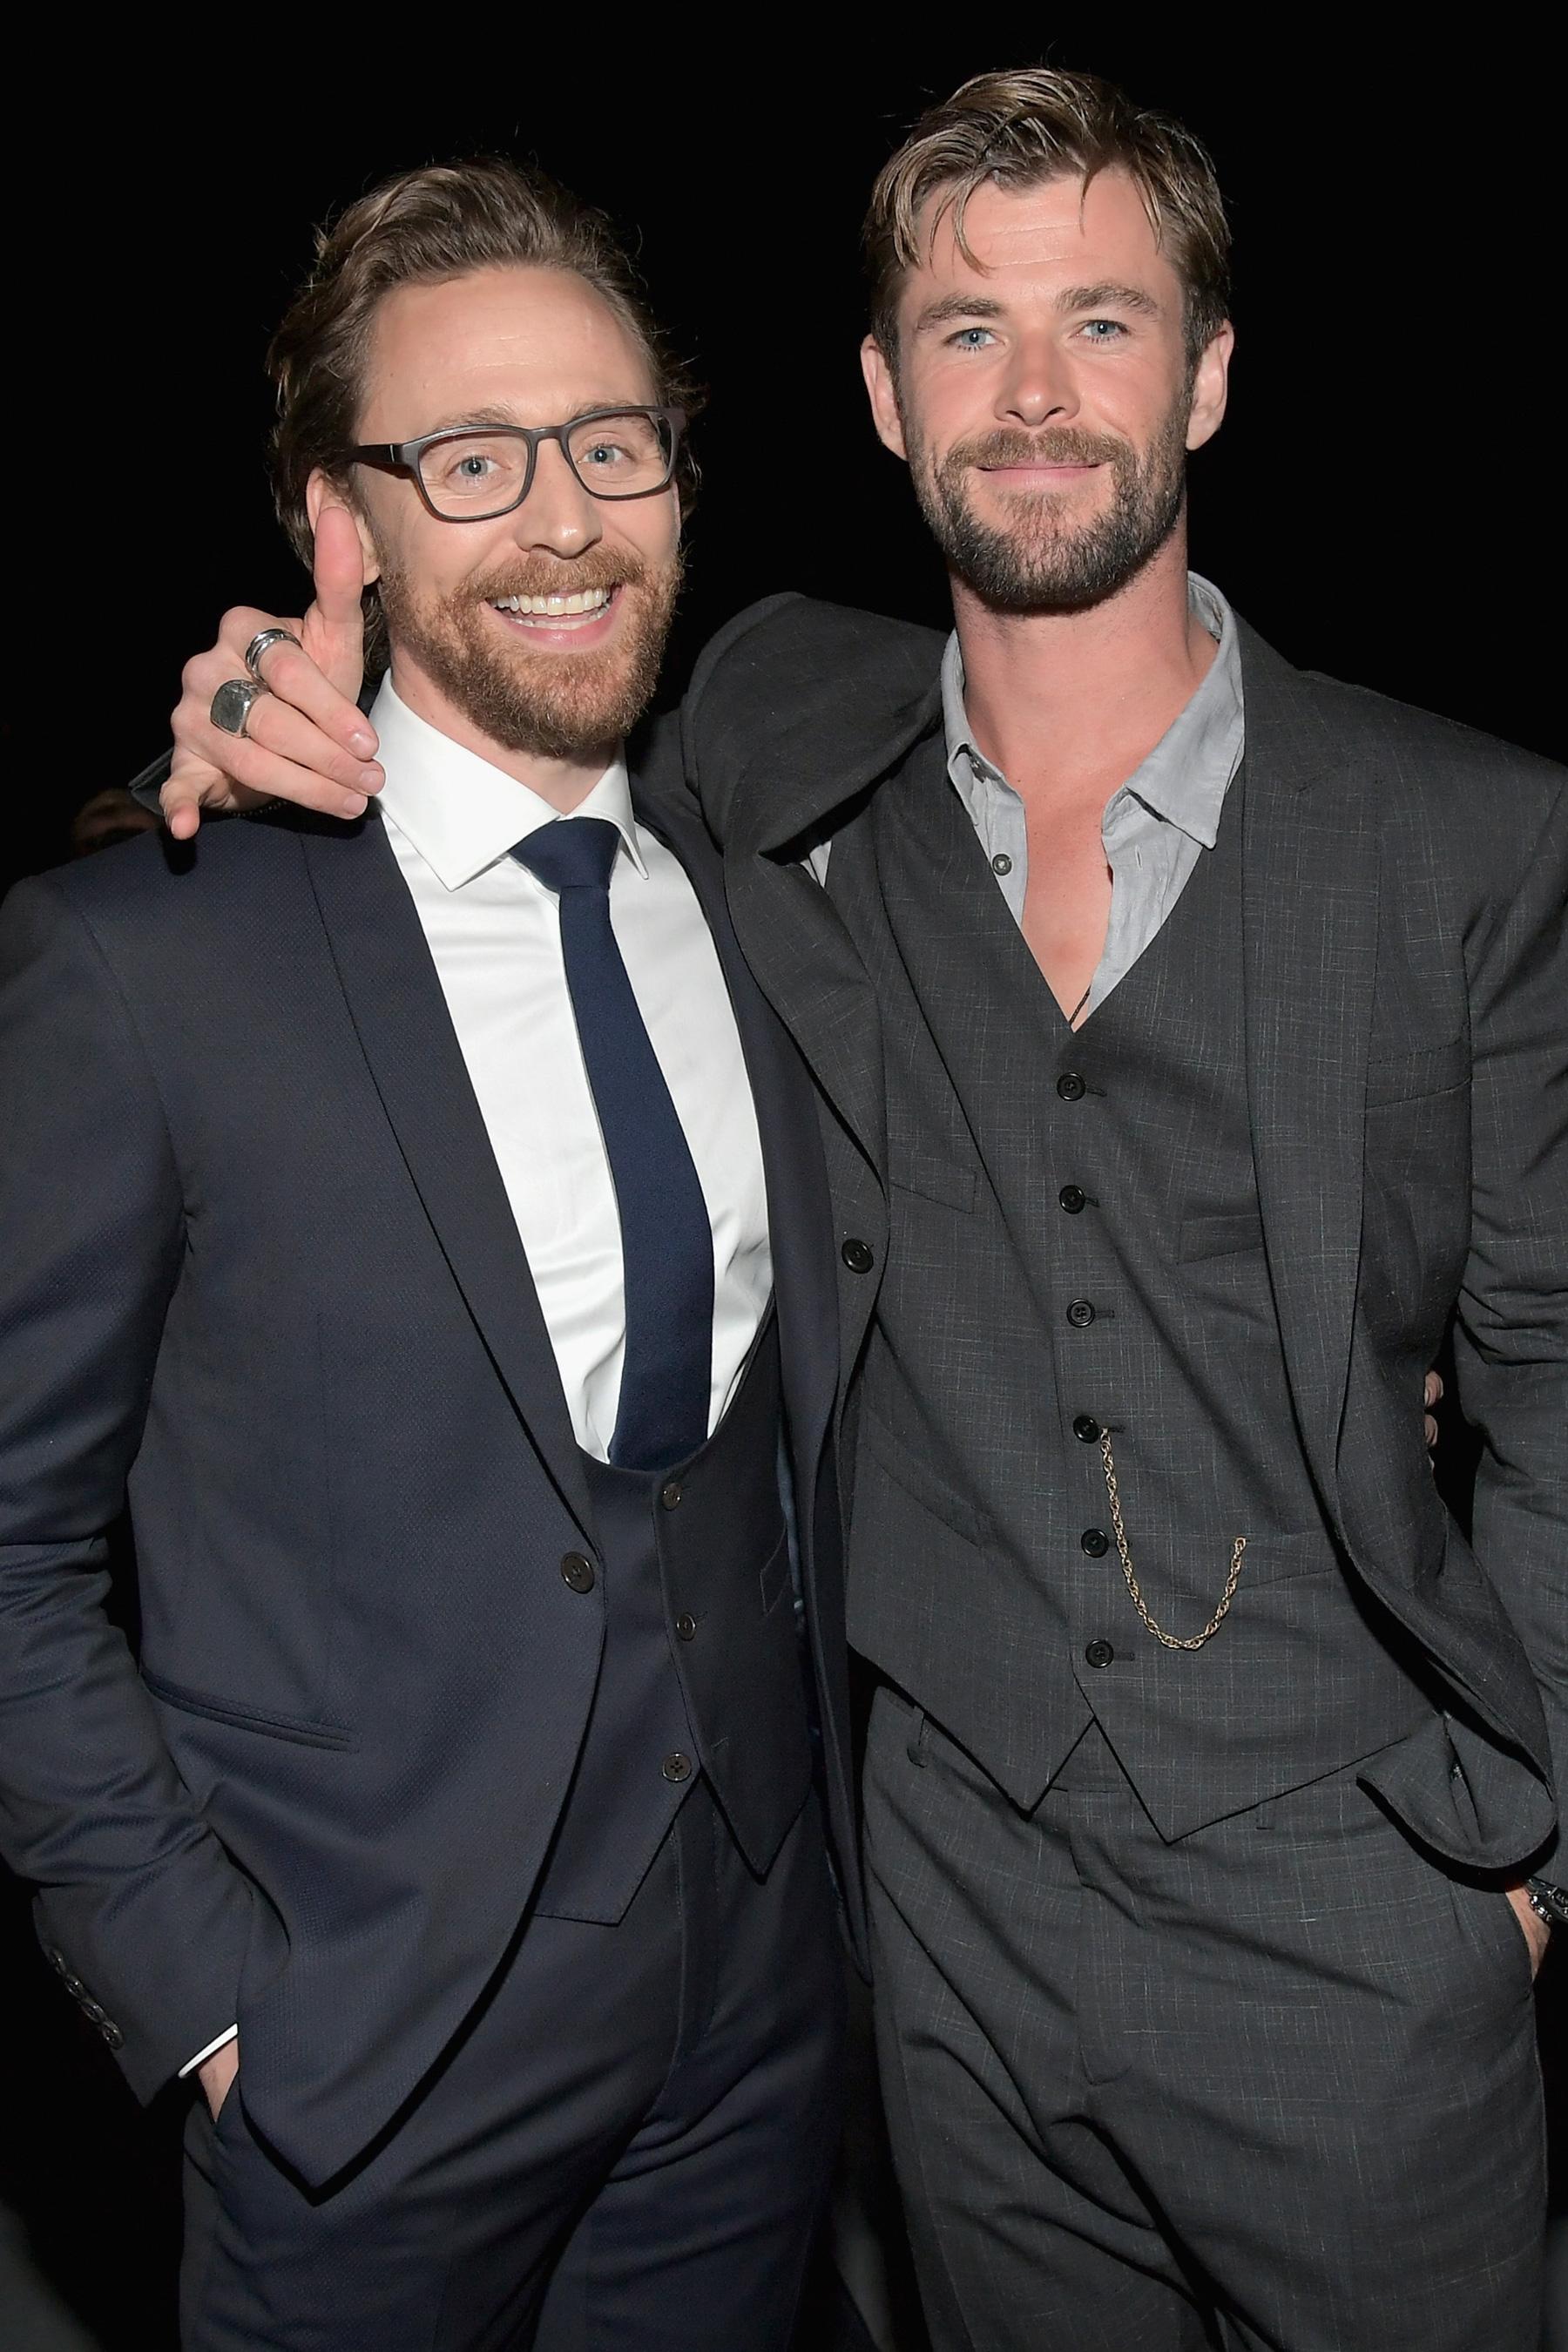 Tom Hiddleston és Chris Hemsworth